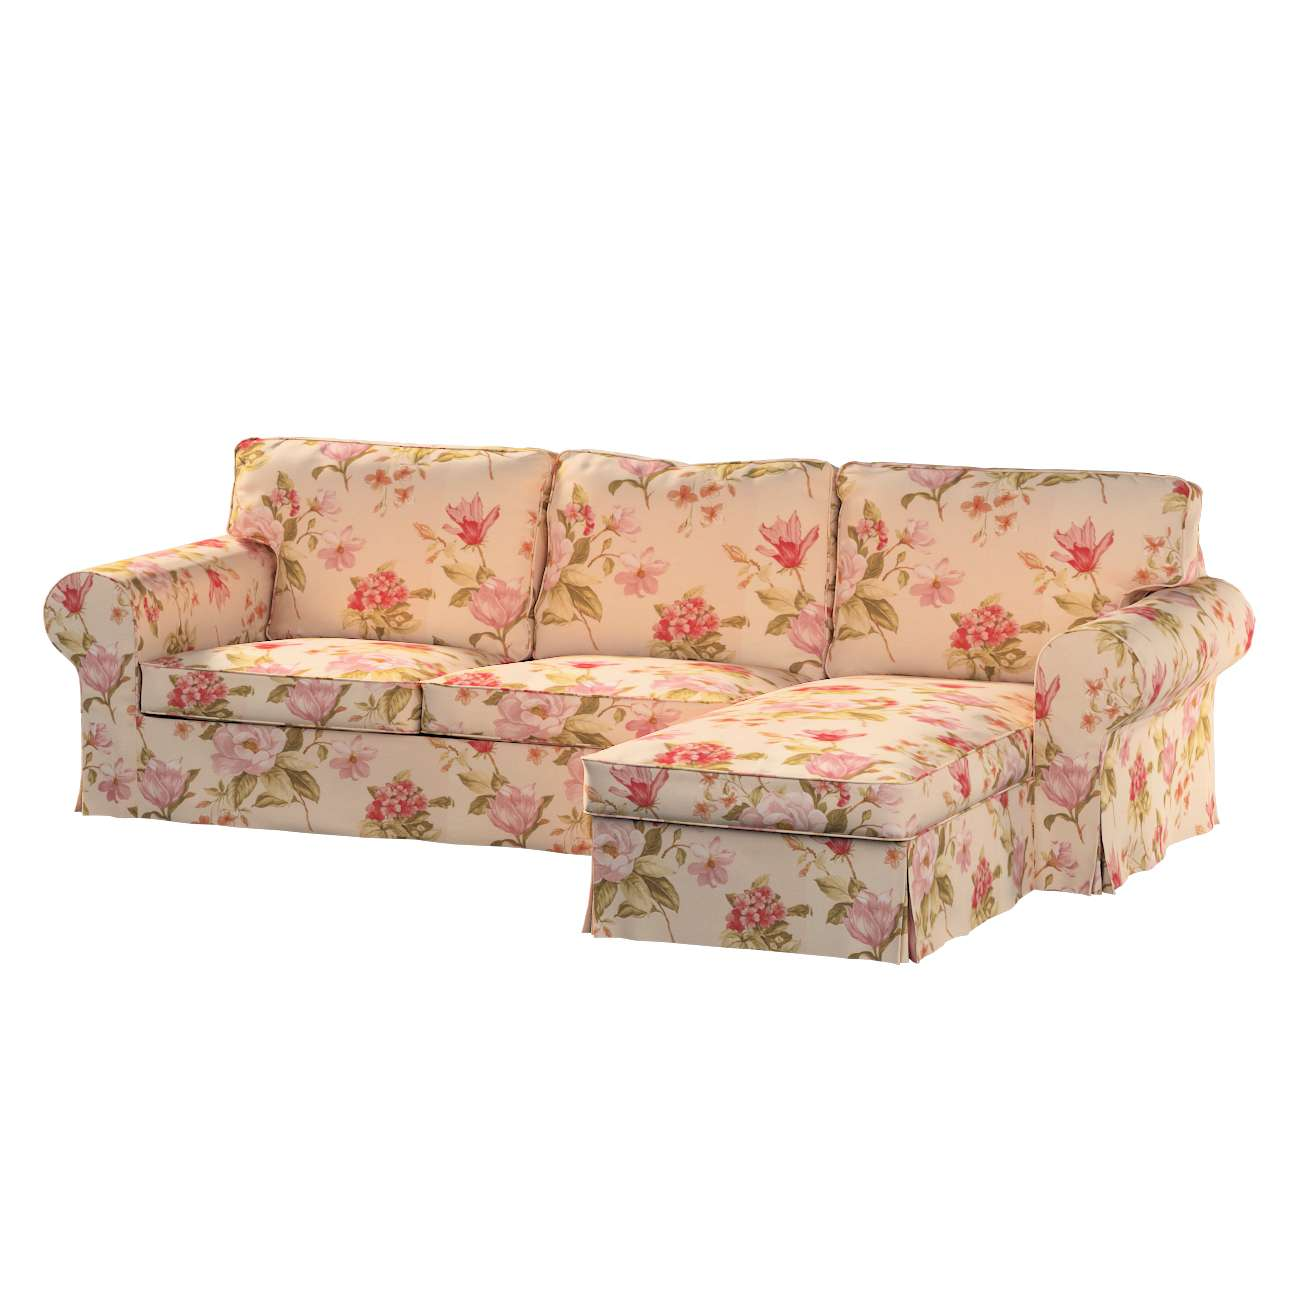 Ektorp 2-Sitzer Sofabezug mit Recamiere Ektorp 2-Sitzer Sofabezug mit Recamiere von der Kollektion Londres, Stoff: 123-05